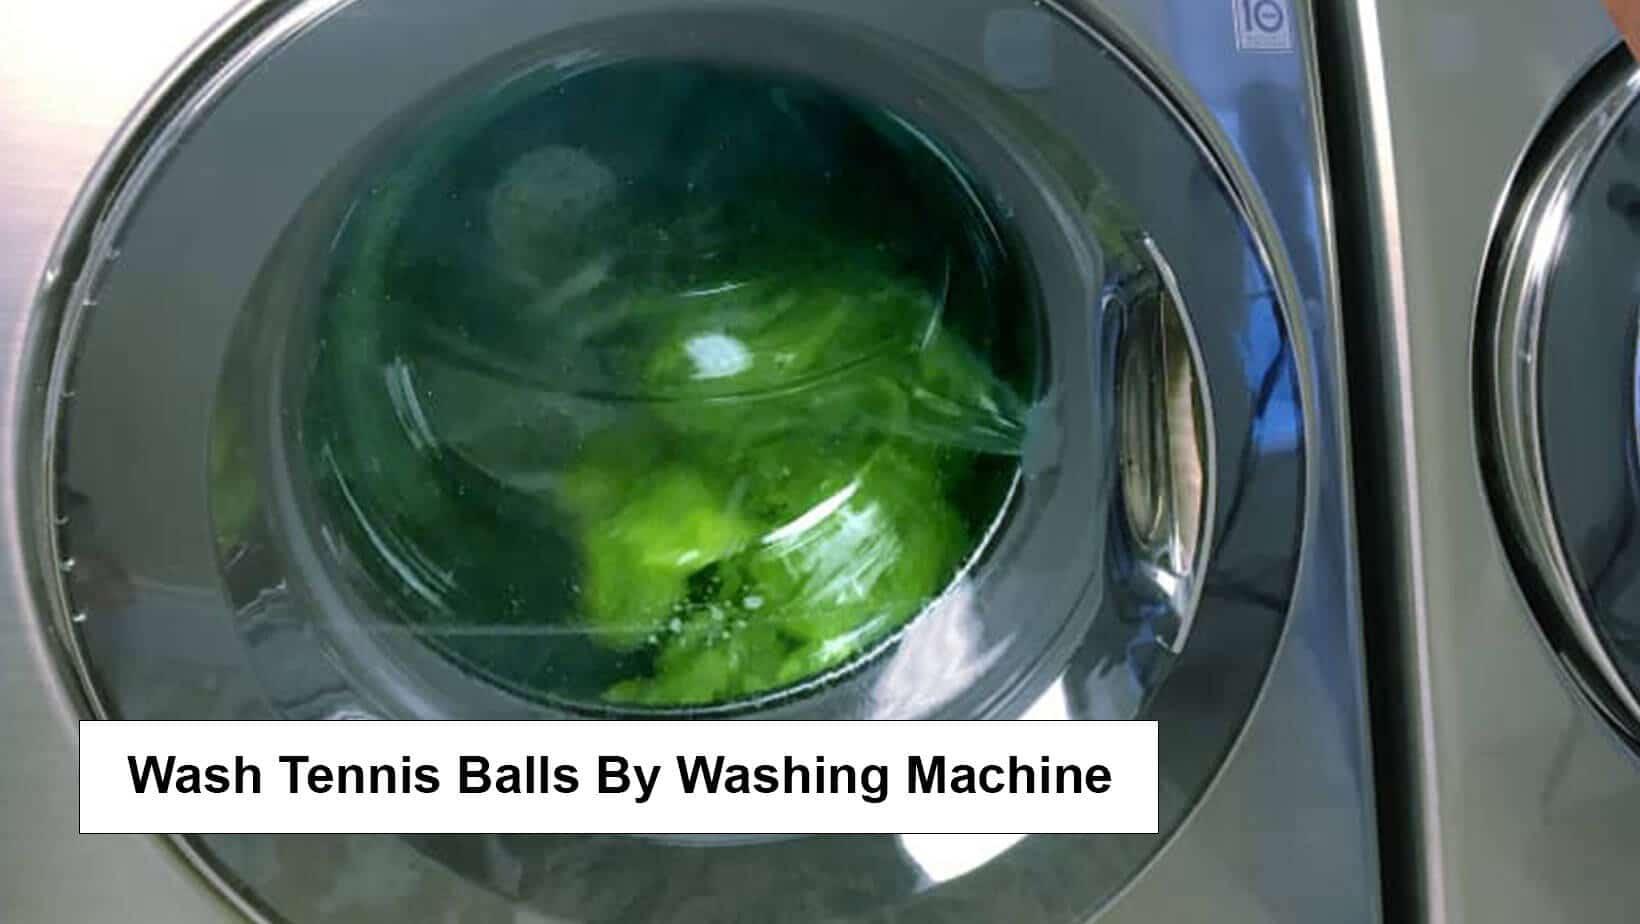 Wash Tennis Balls Using Washing Machine